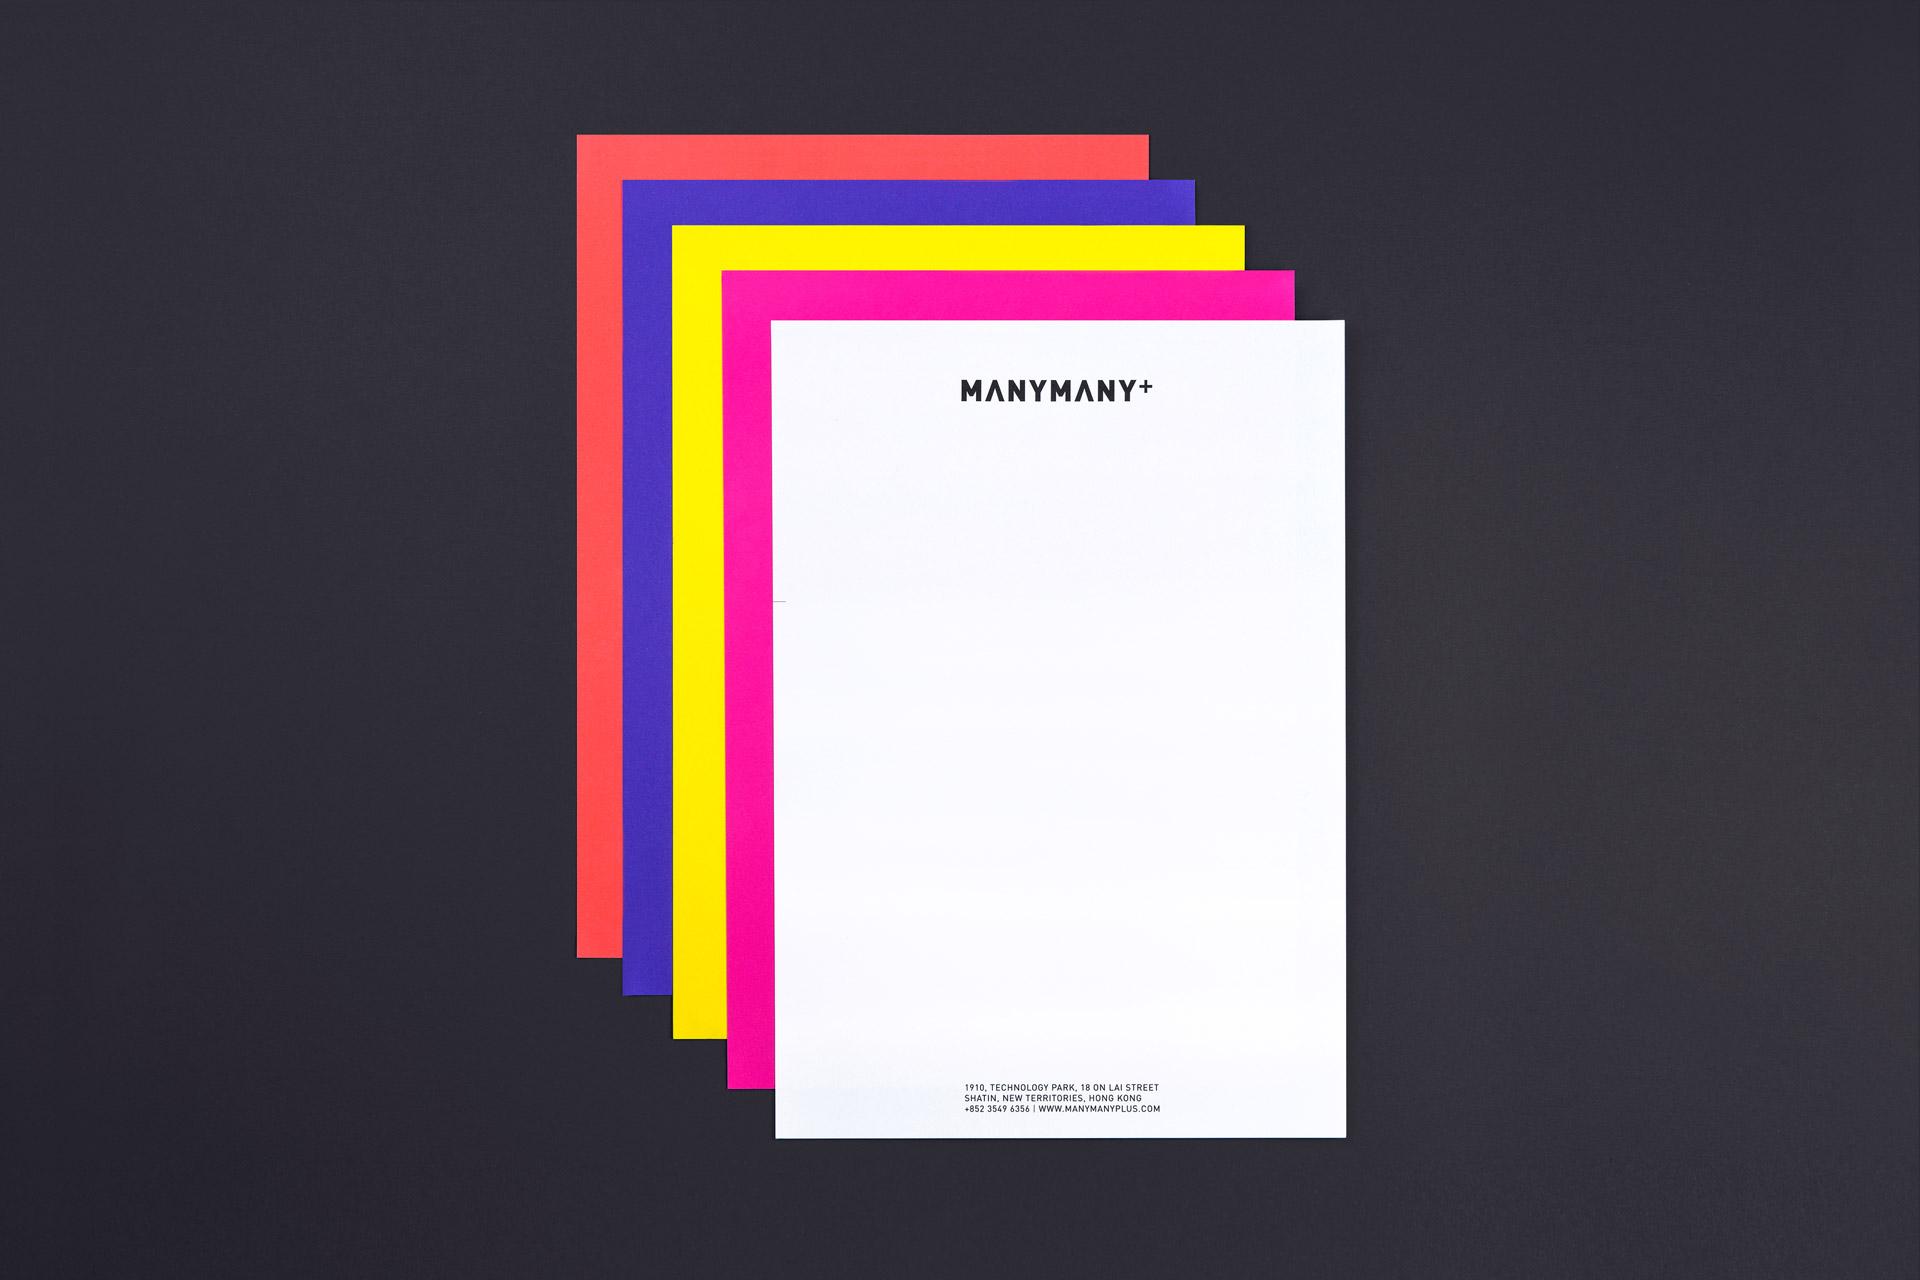 manymany-plus_06